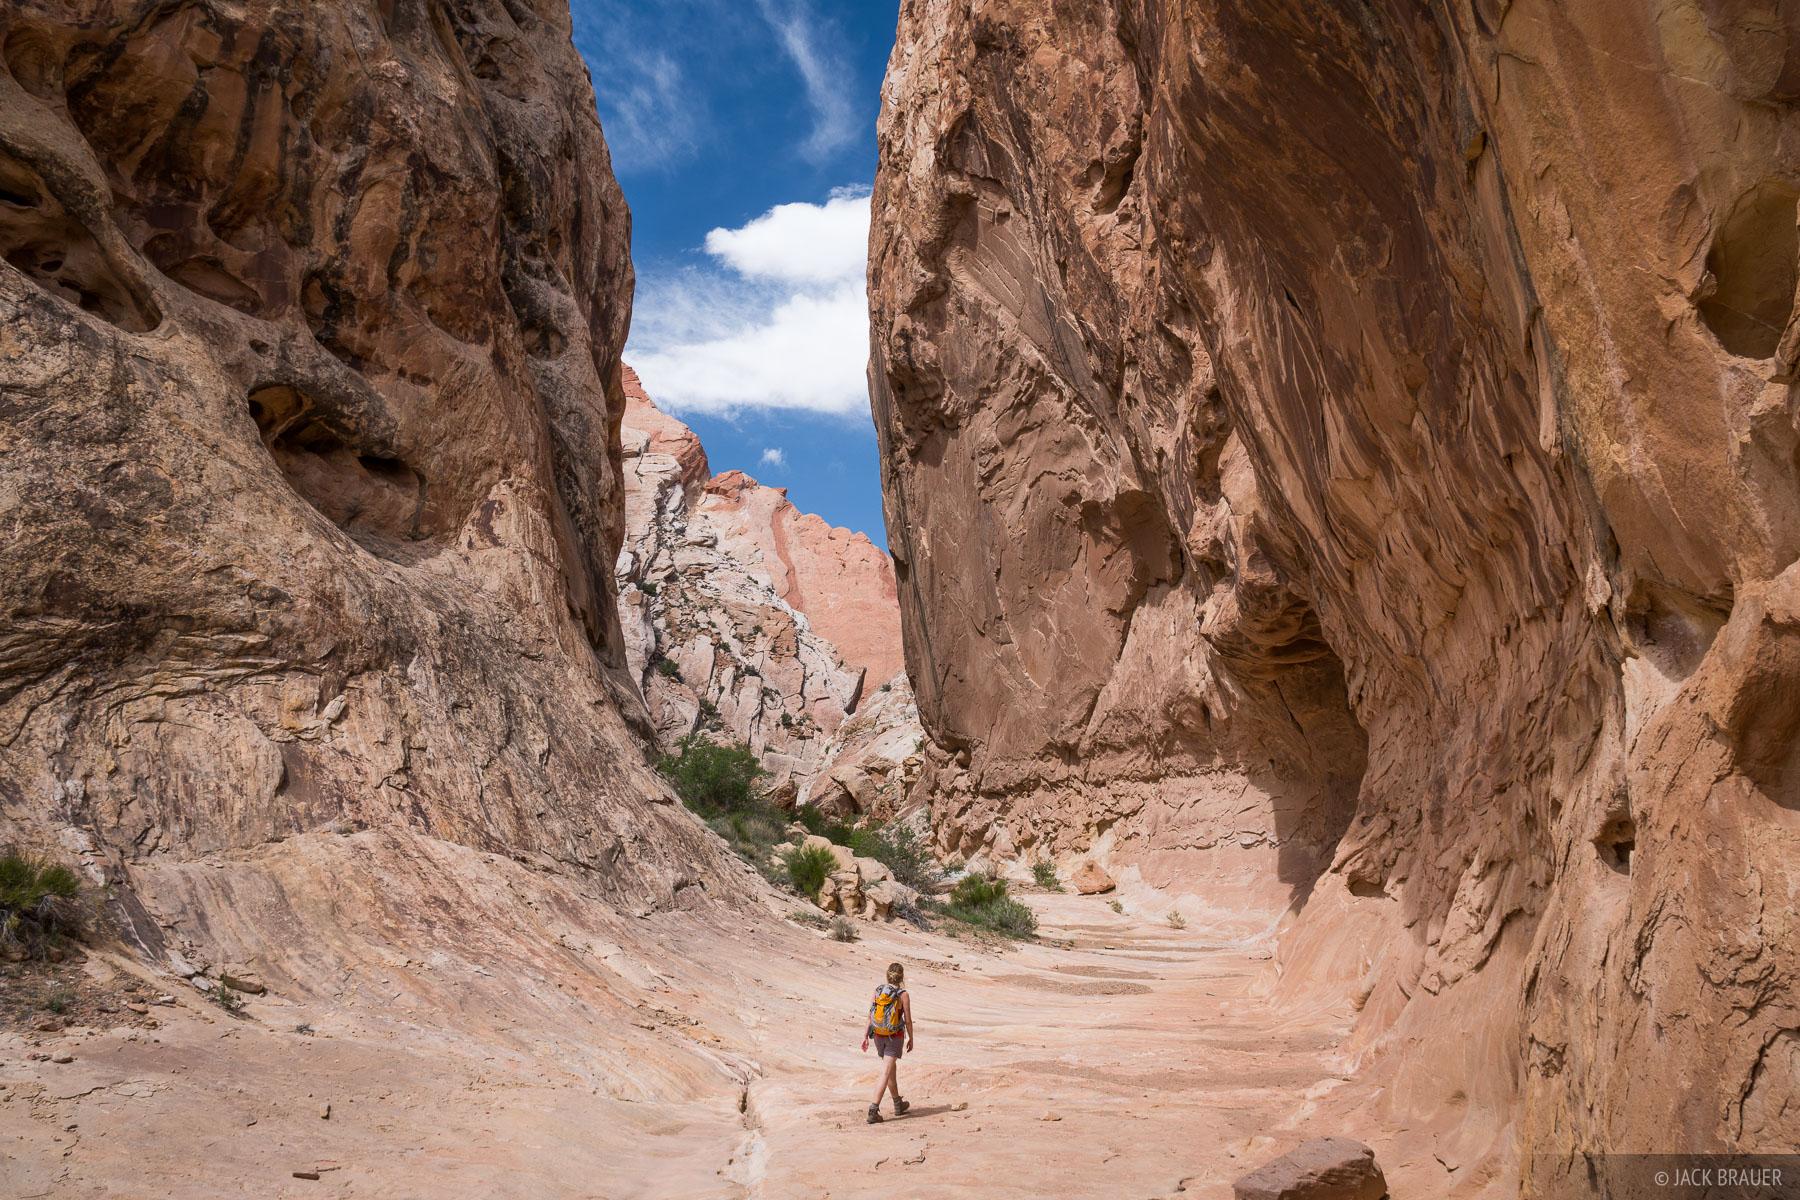 Little Spotted Wolf Canyon, San Rafael Swell, Utah, hiking, photo